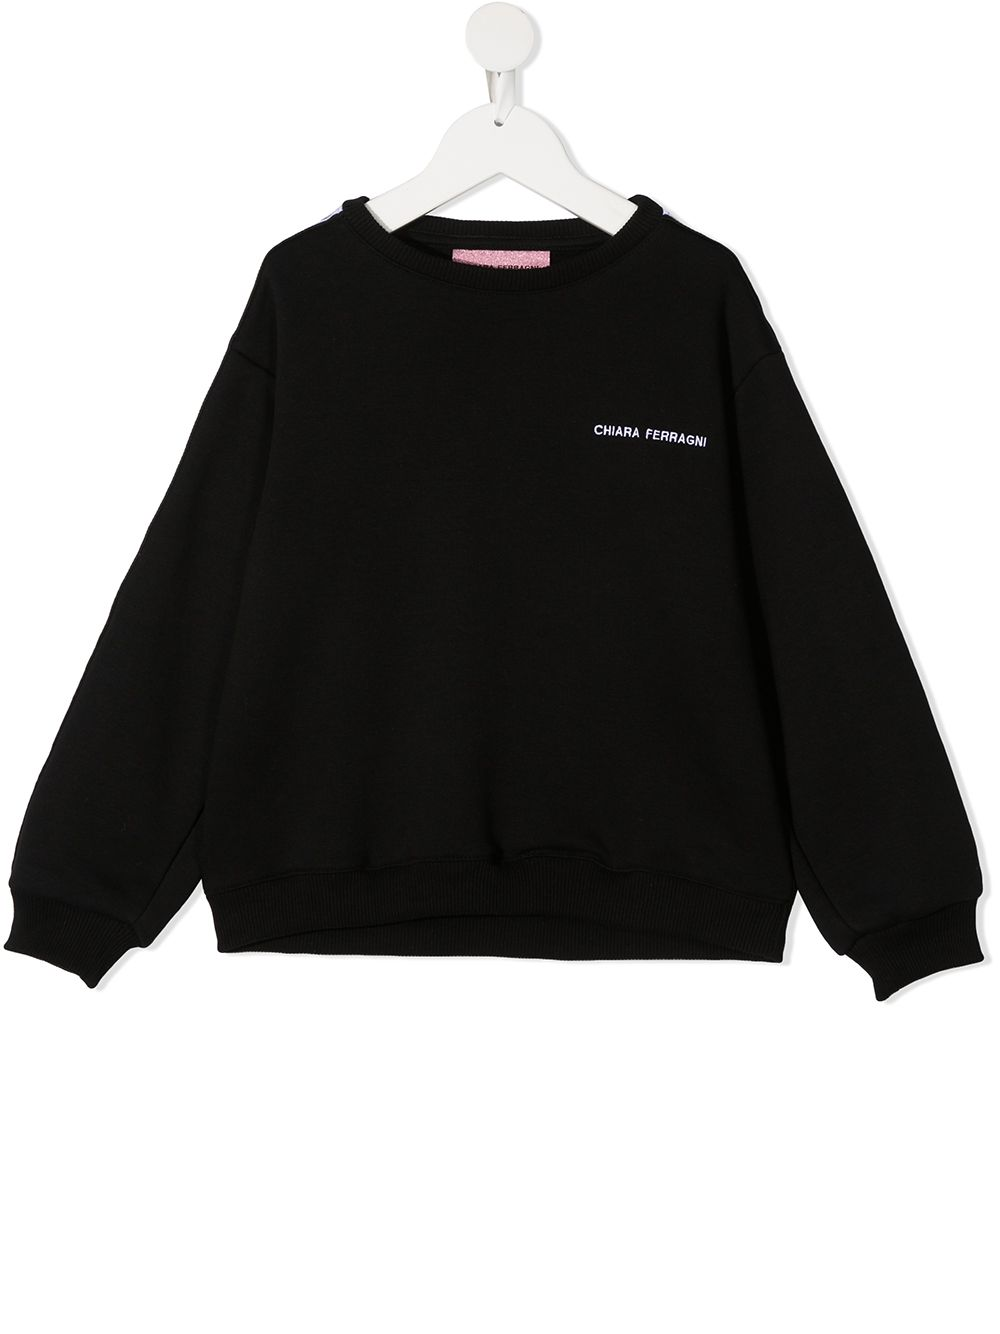 CHIARA FERRAGNI | Sweatshirt | CFK036NE